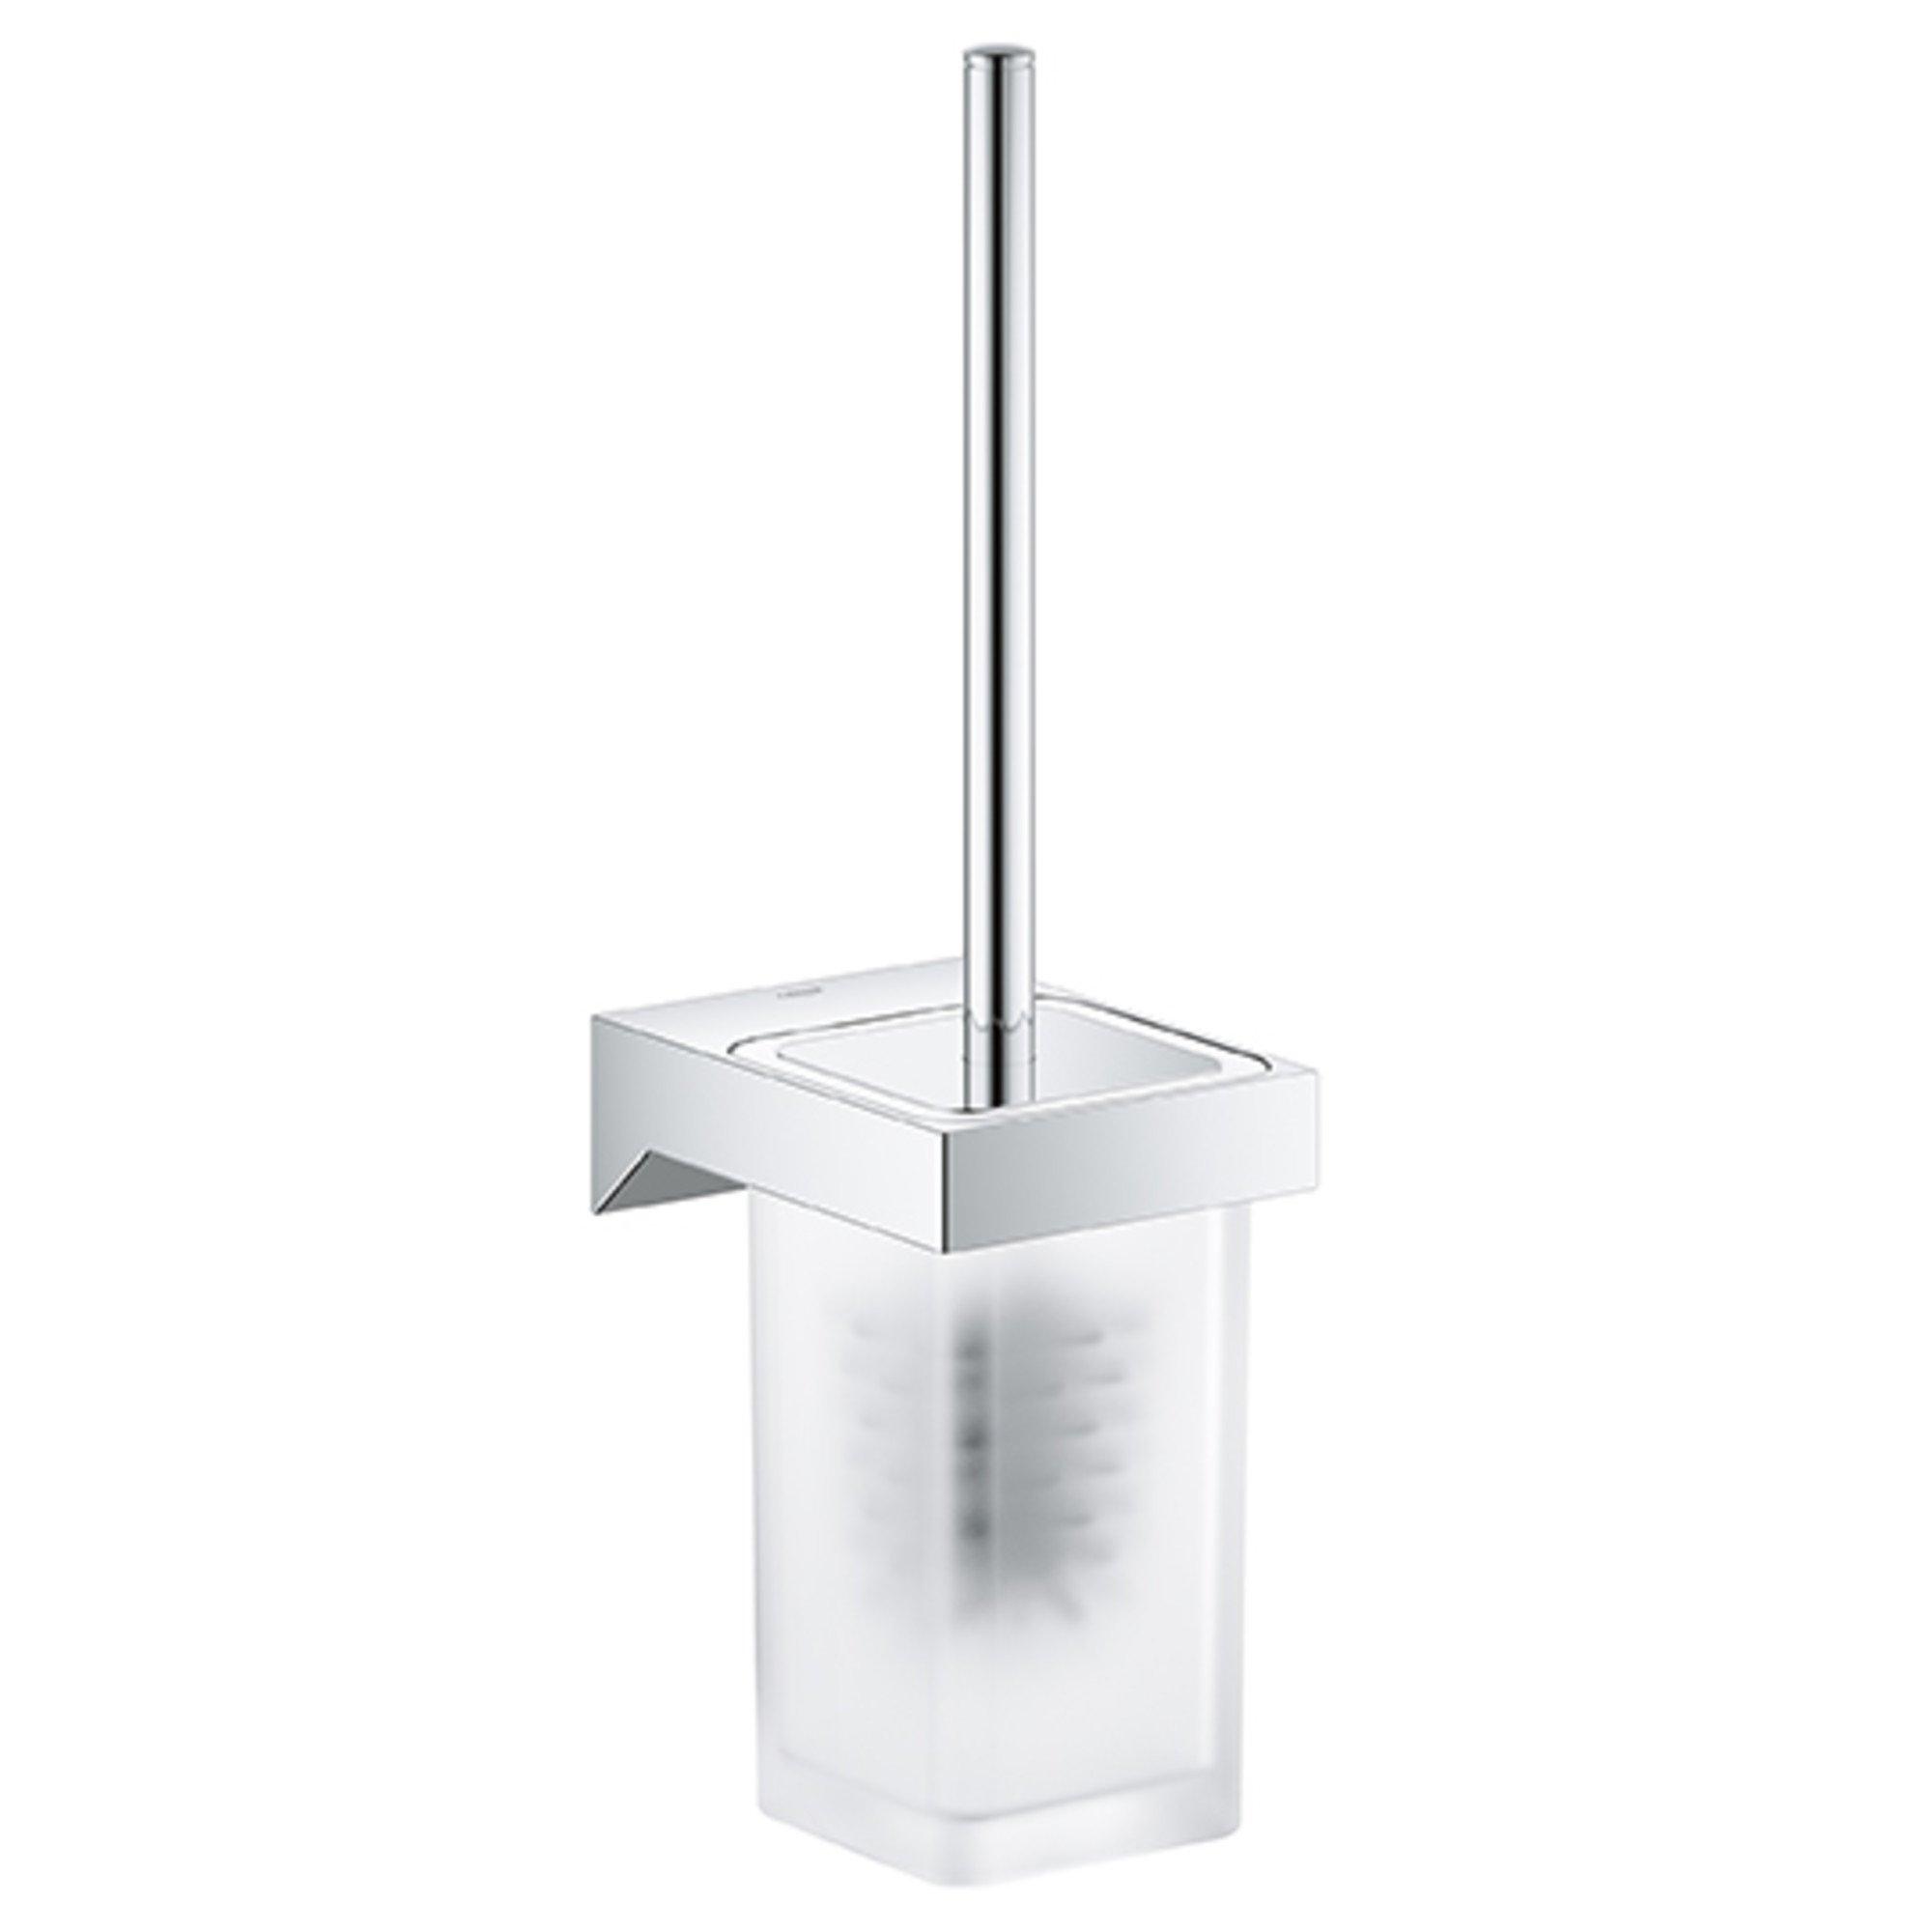 GROHE 40857000 Selection Cube Toilet Brush Set, Starlight Chrome